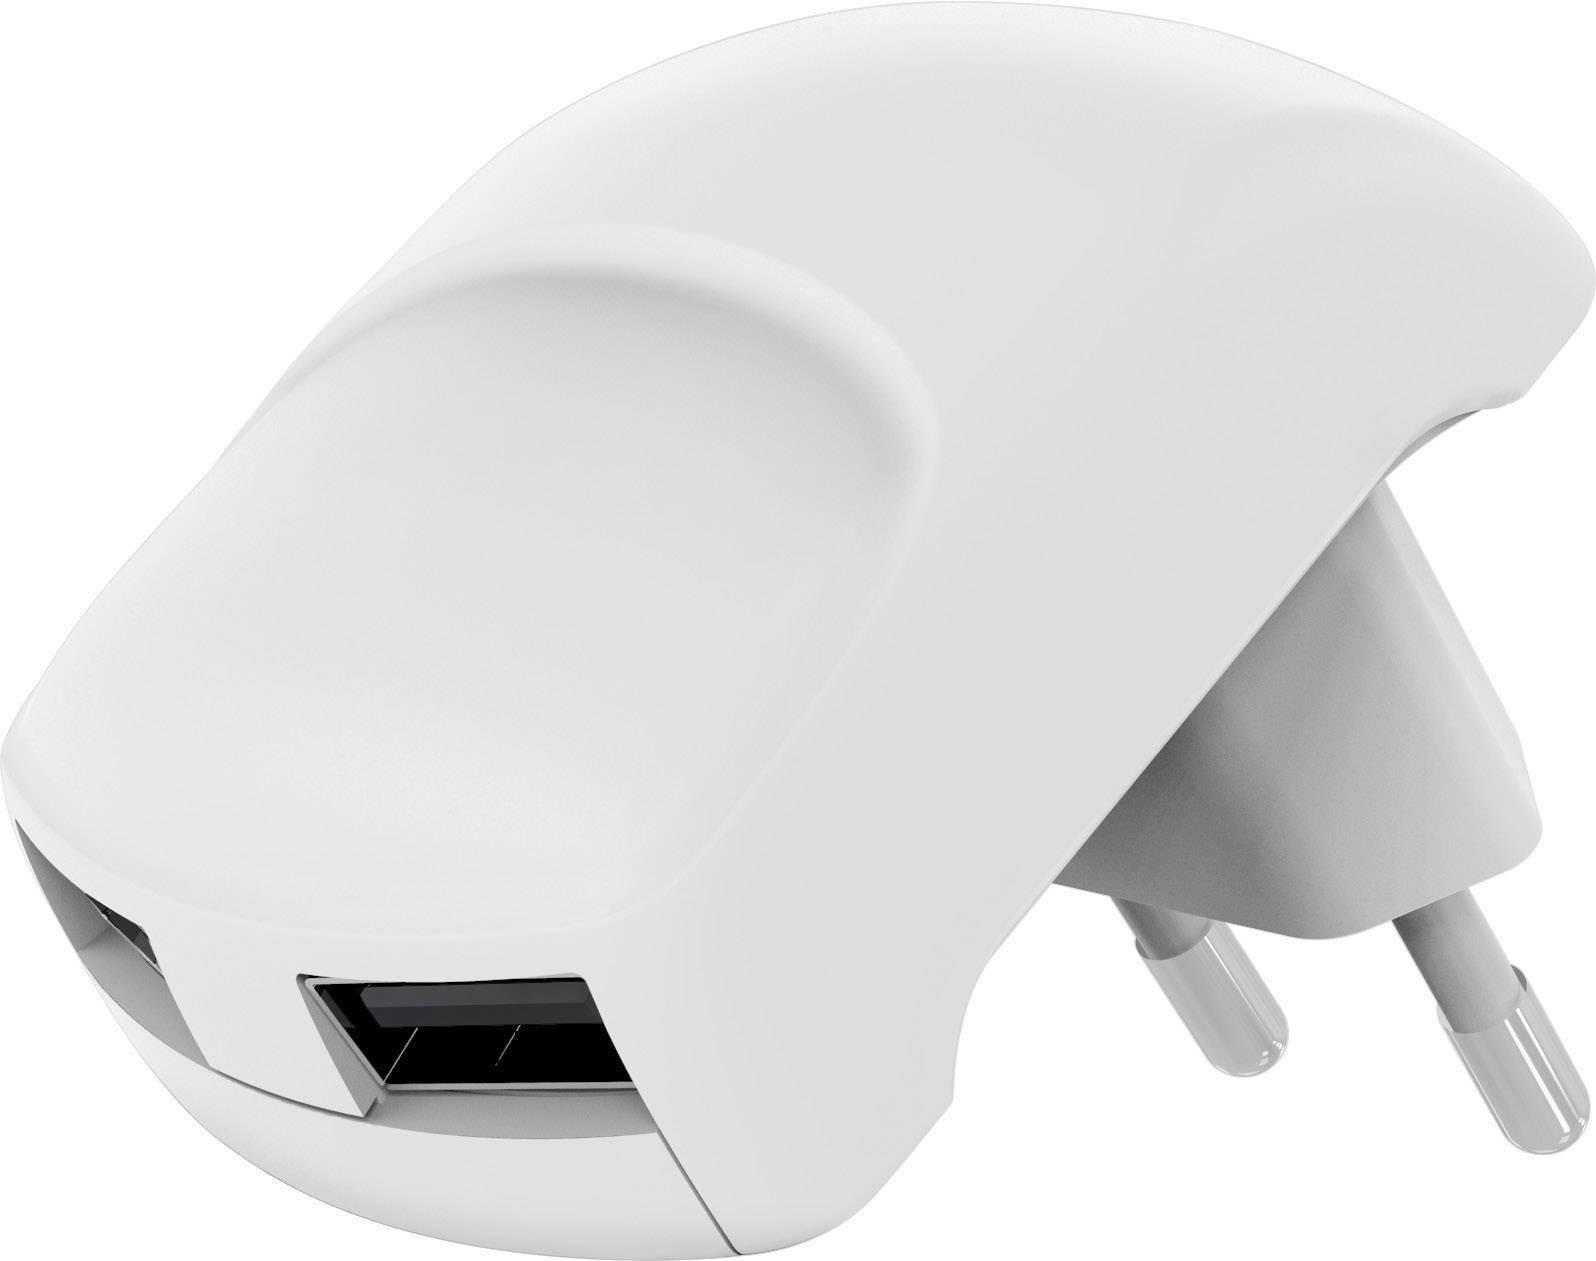 USB nabíjačka Goobay 59234, 2400 mA, biela